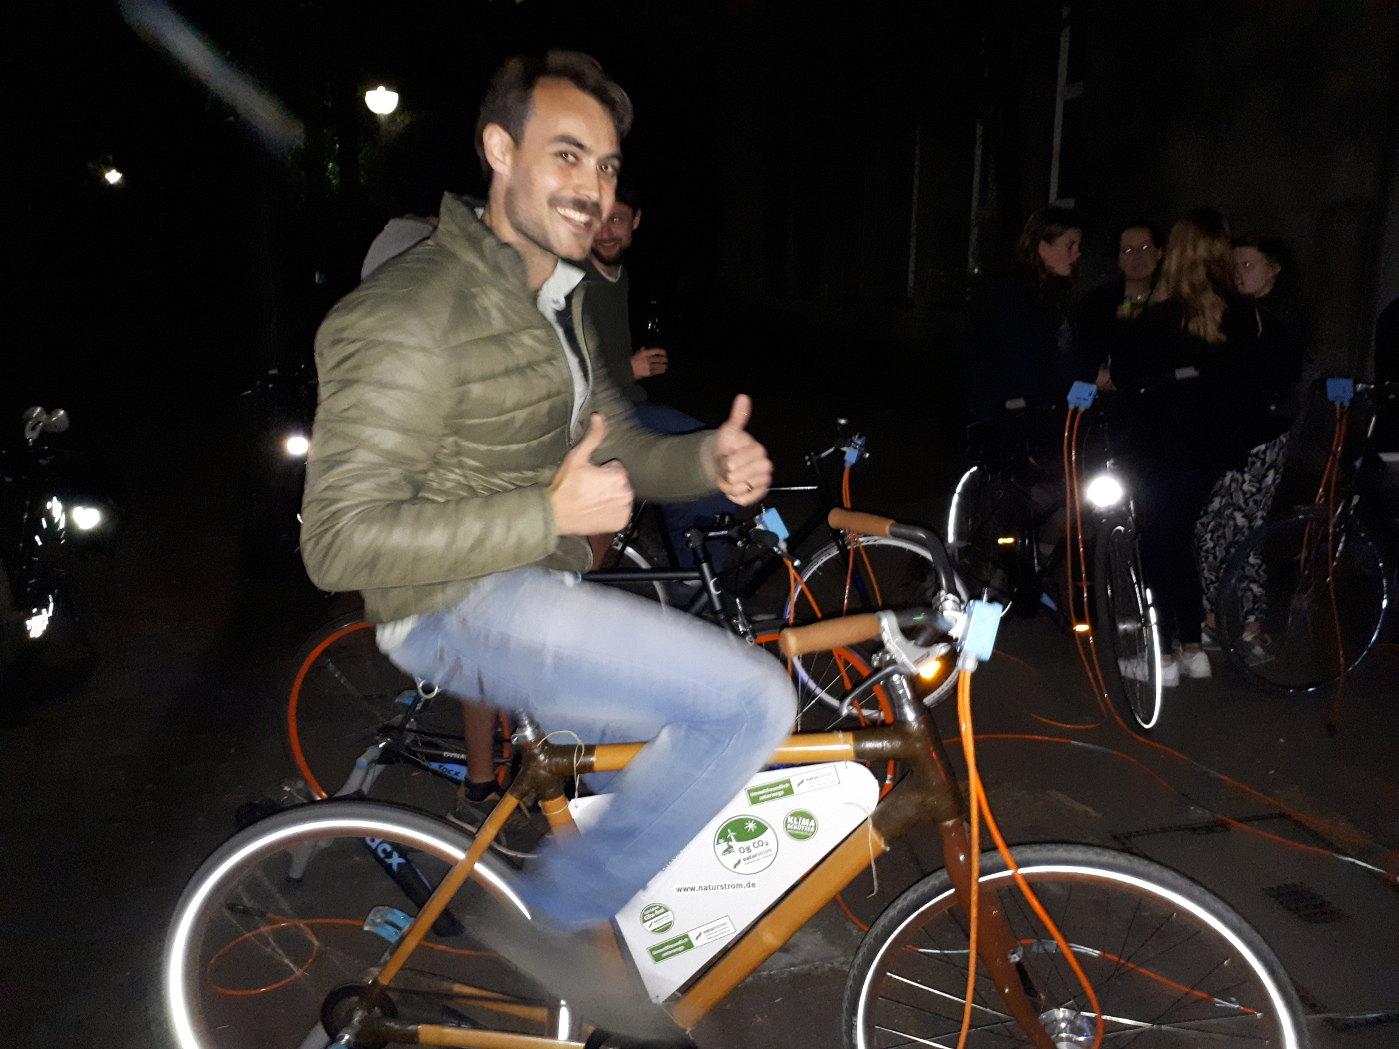 Fahrrad-Disko_TU-Berlin_20180506_000707